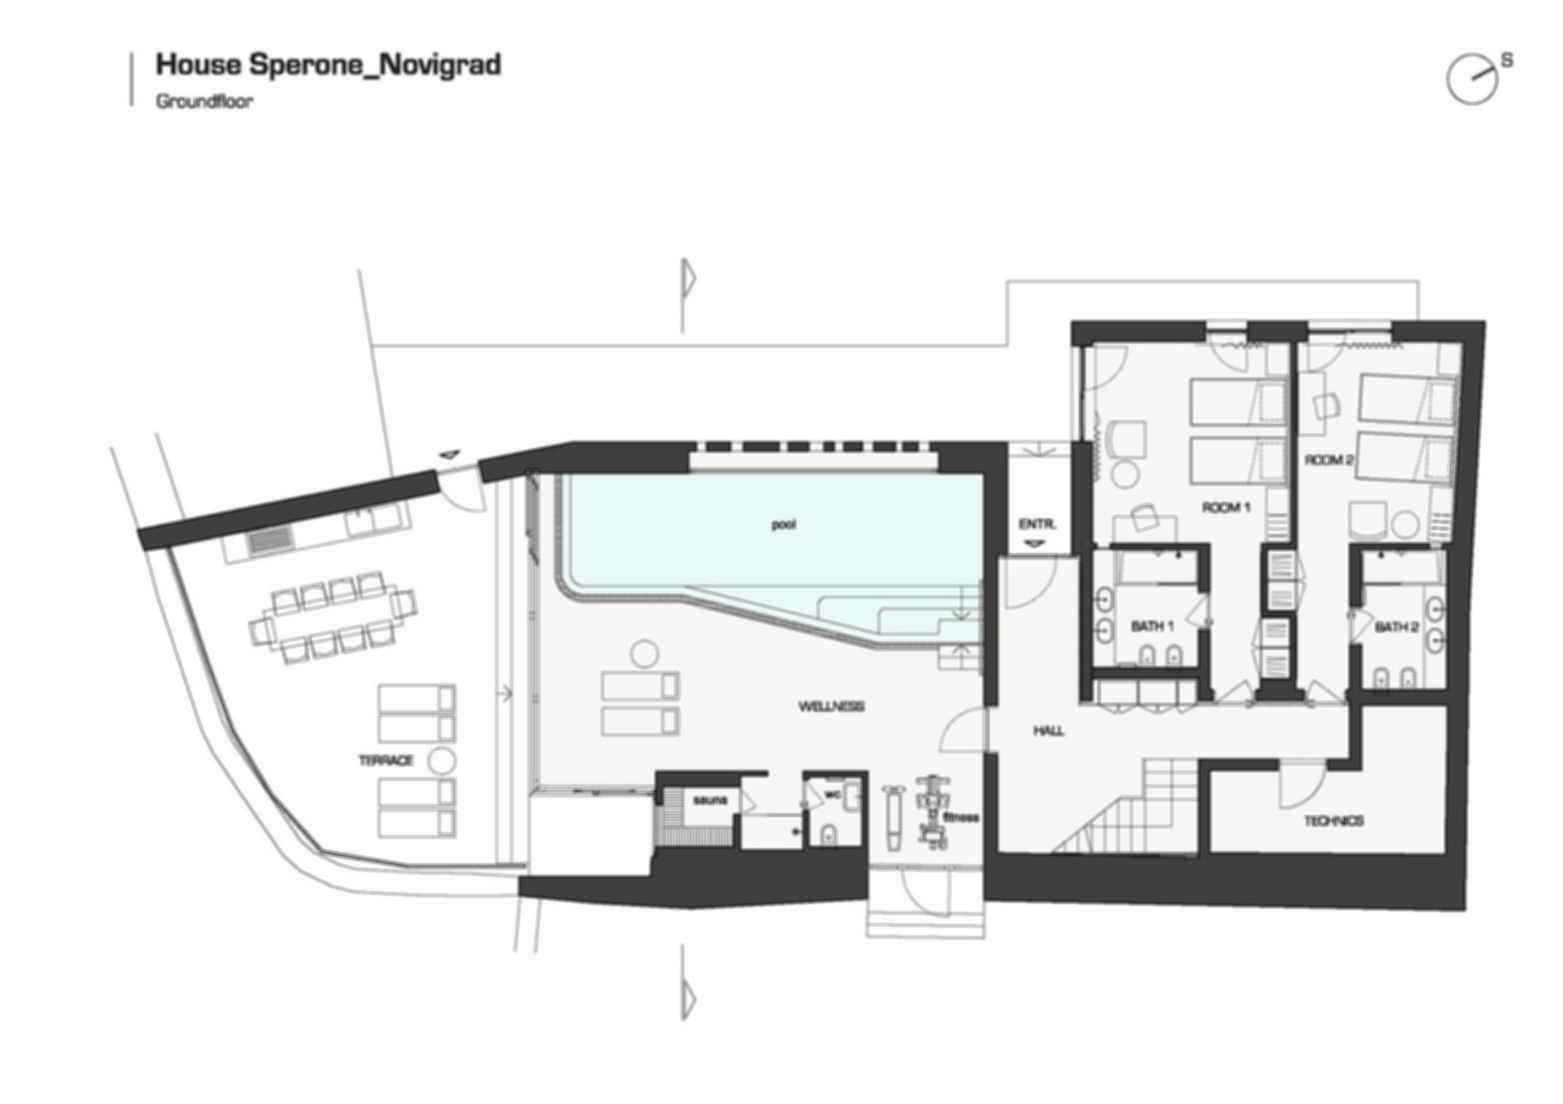 House Sperone - Site Plan